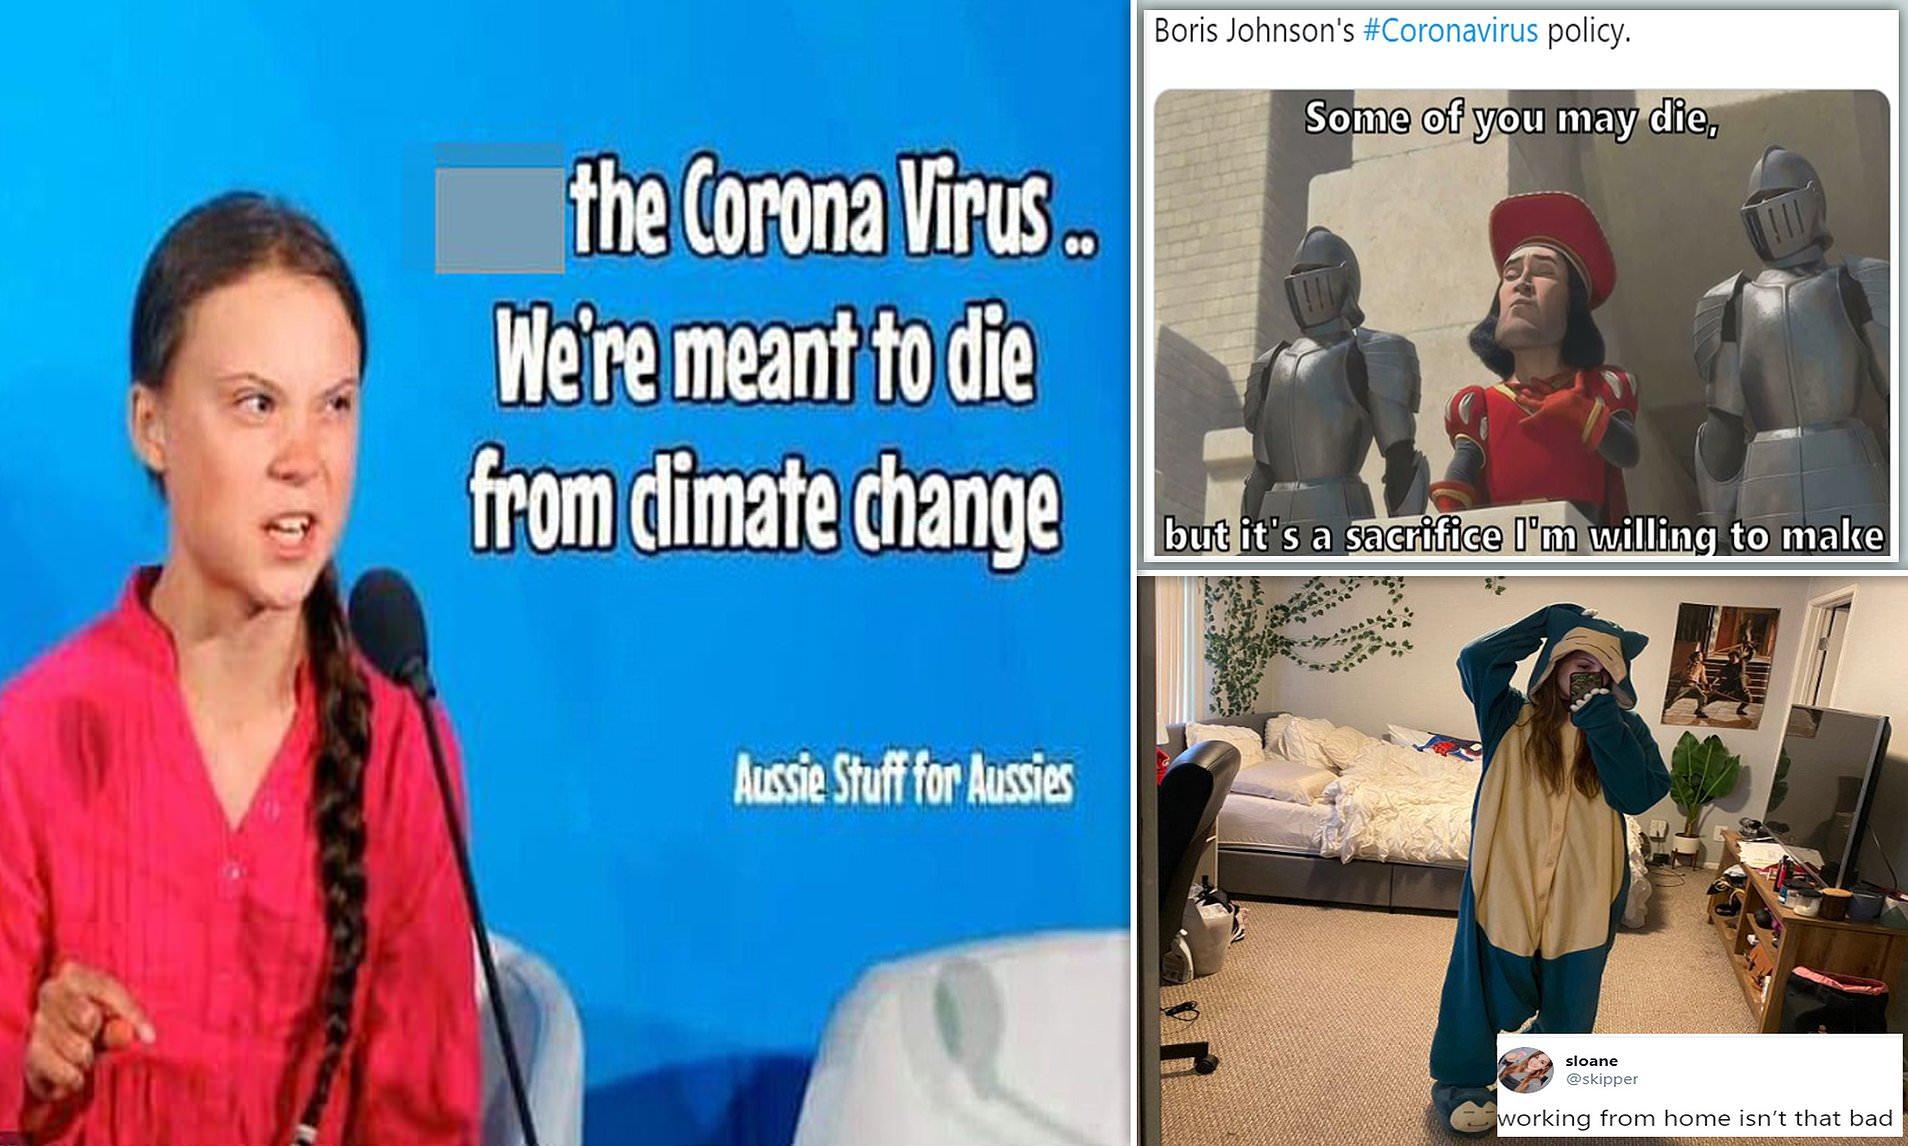 Post Your Favourite Covid19 Meme - Humour - Australian ...